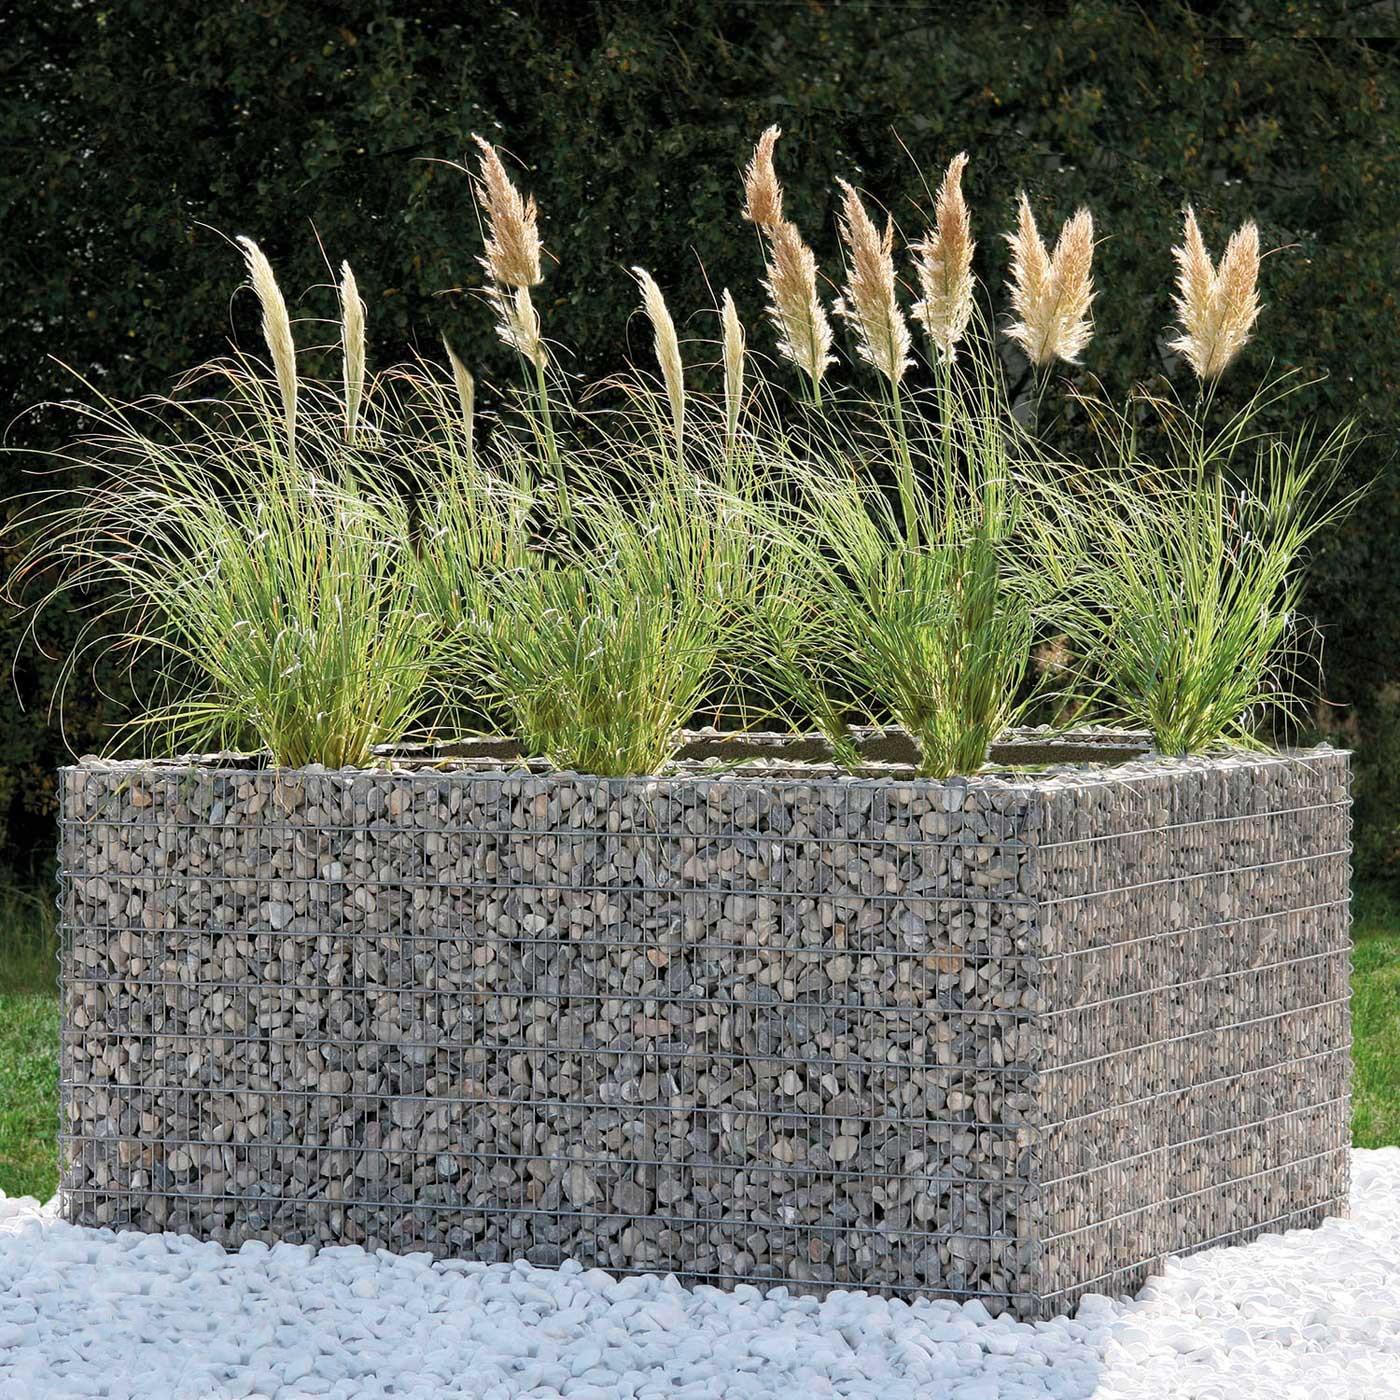 100+ [ Mur Cailloux Grillage ] | Beautiful Cloture Jardin ... pour Bordure De Jardin En Grillage